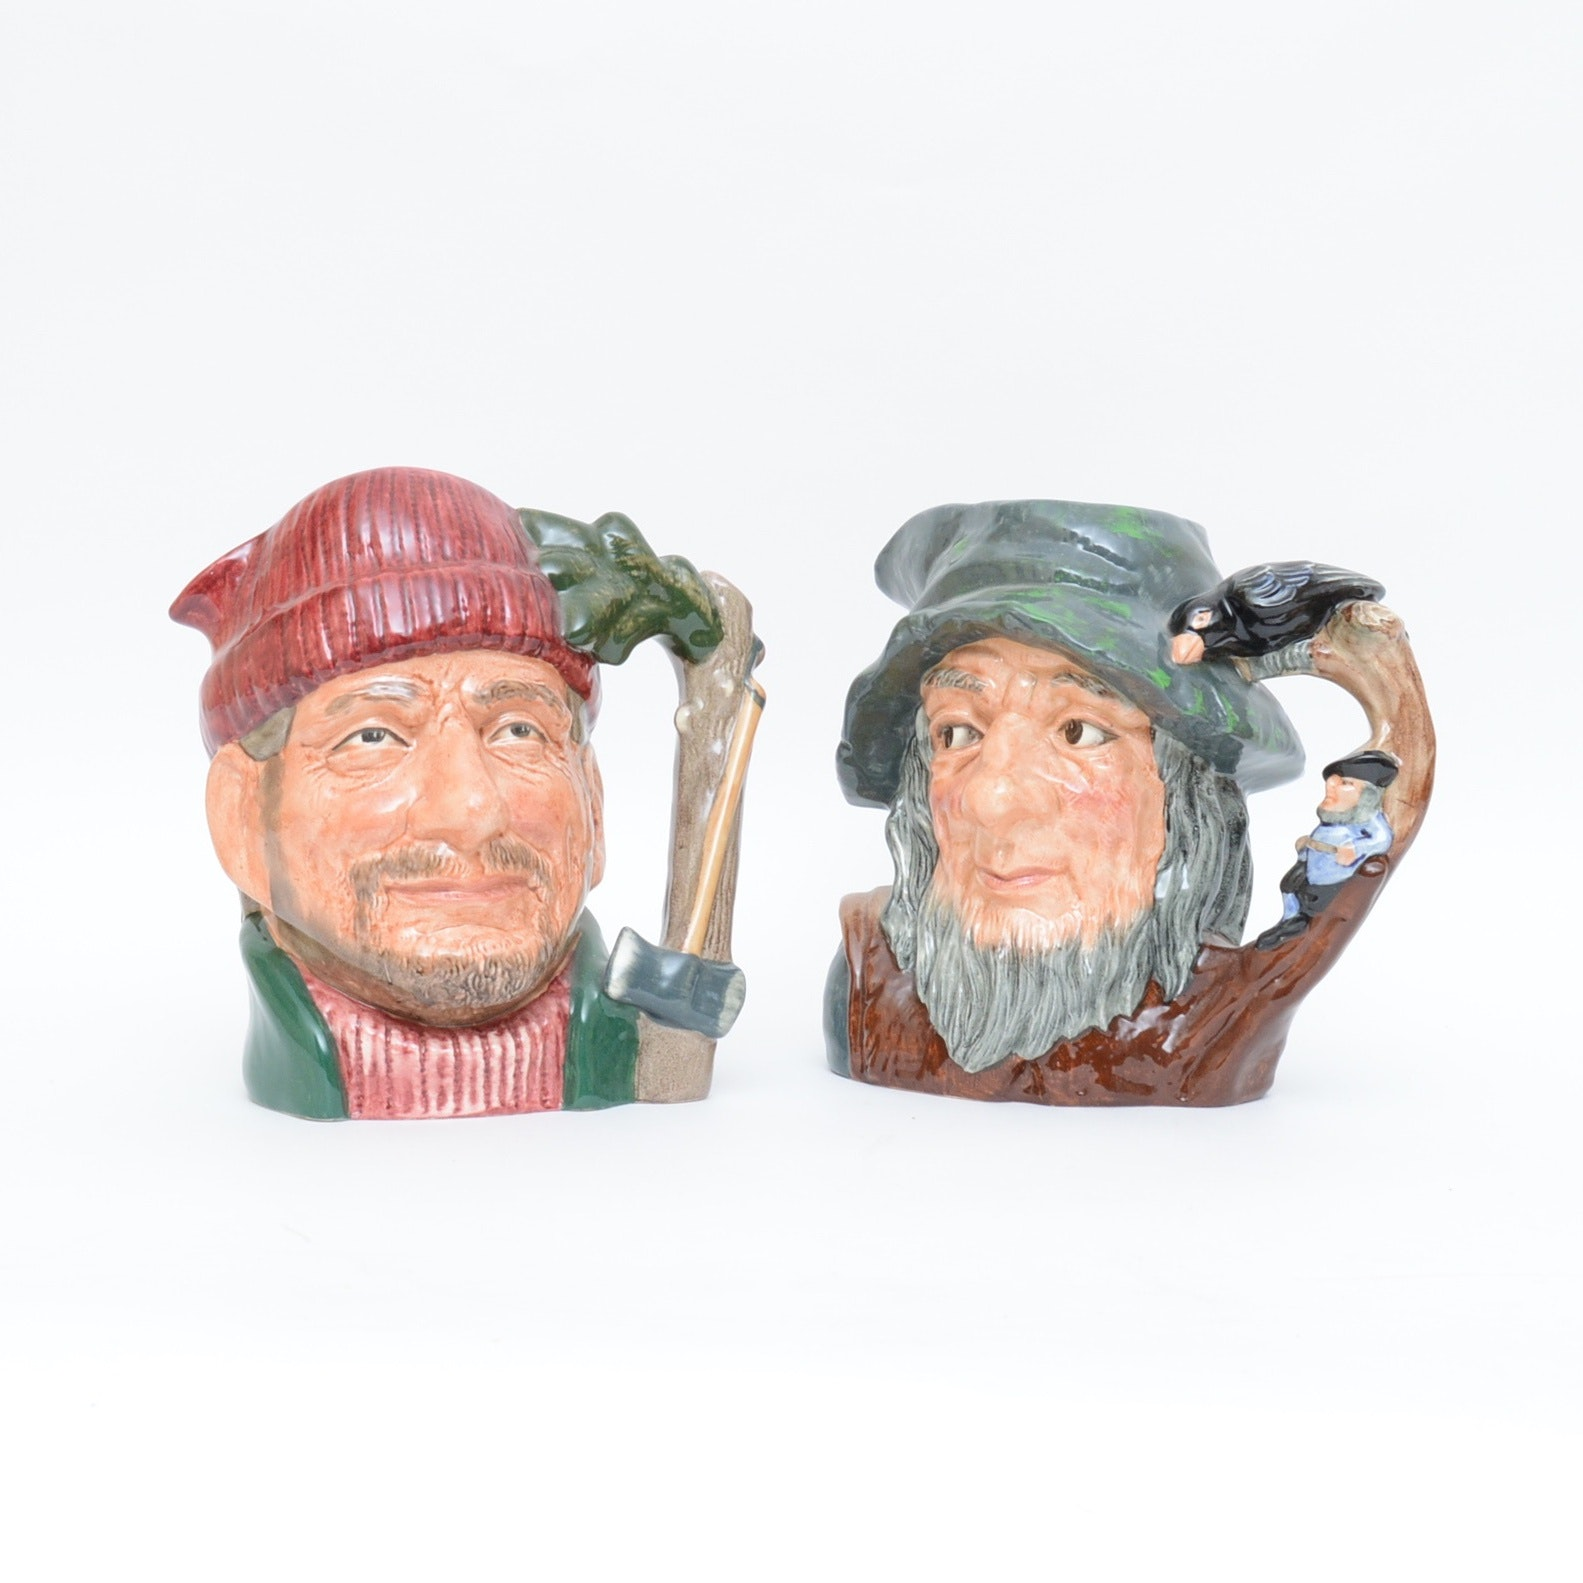 Pair of Vintage Royal Doulton Toby Mugs